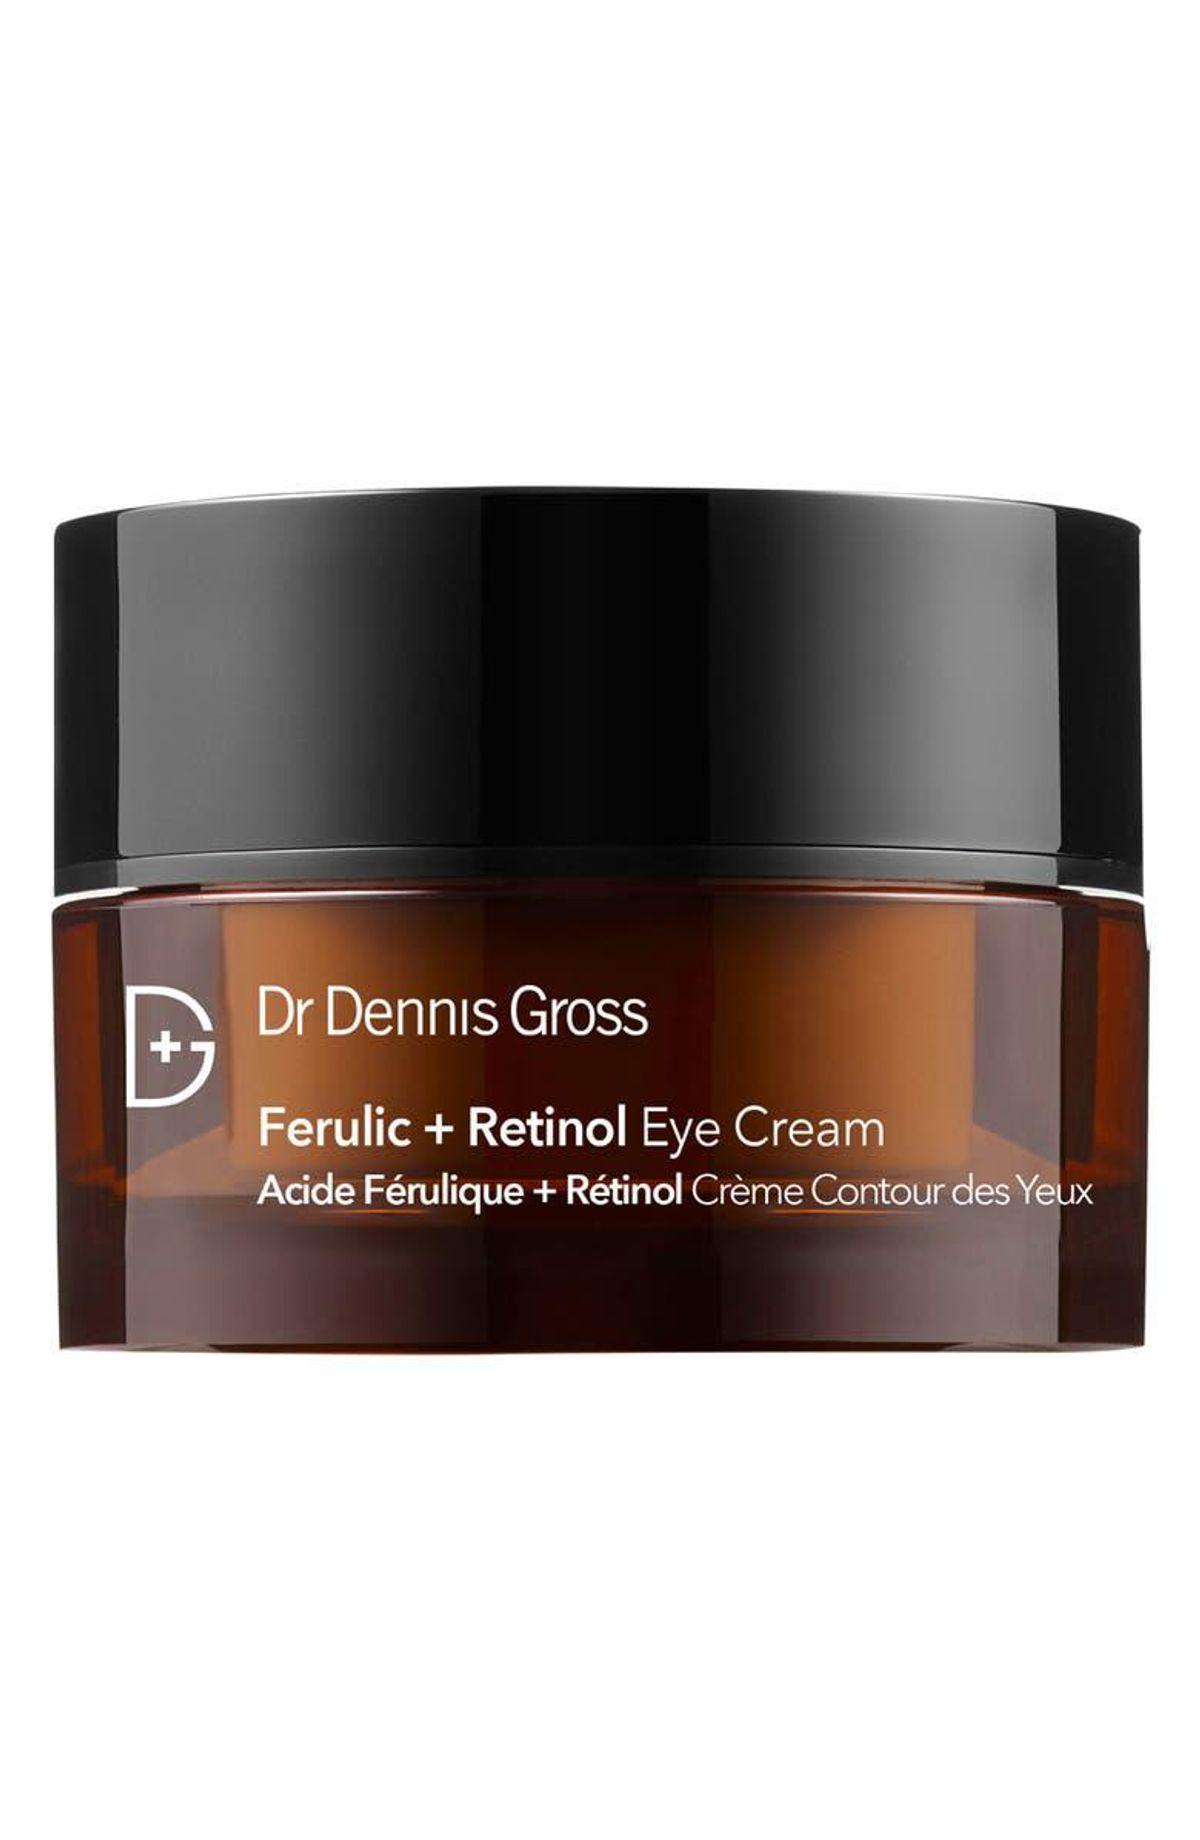 dr dennis gross skincare ferulic and retinol eye cream